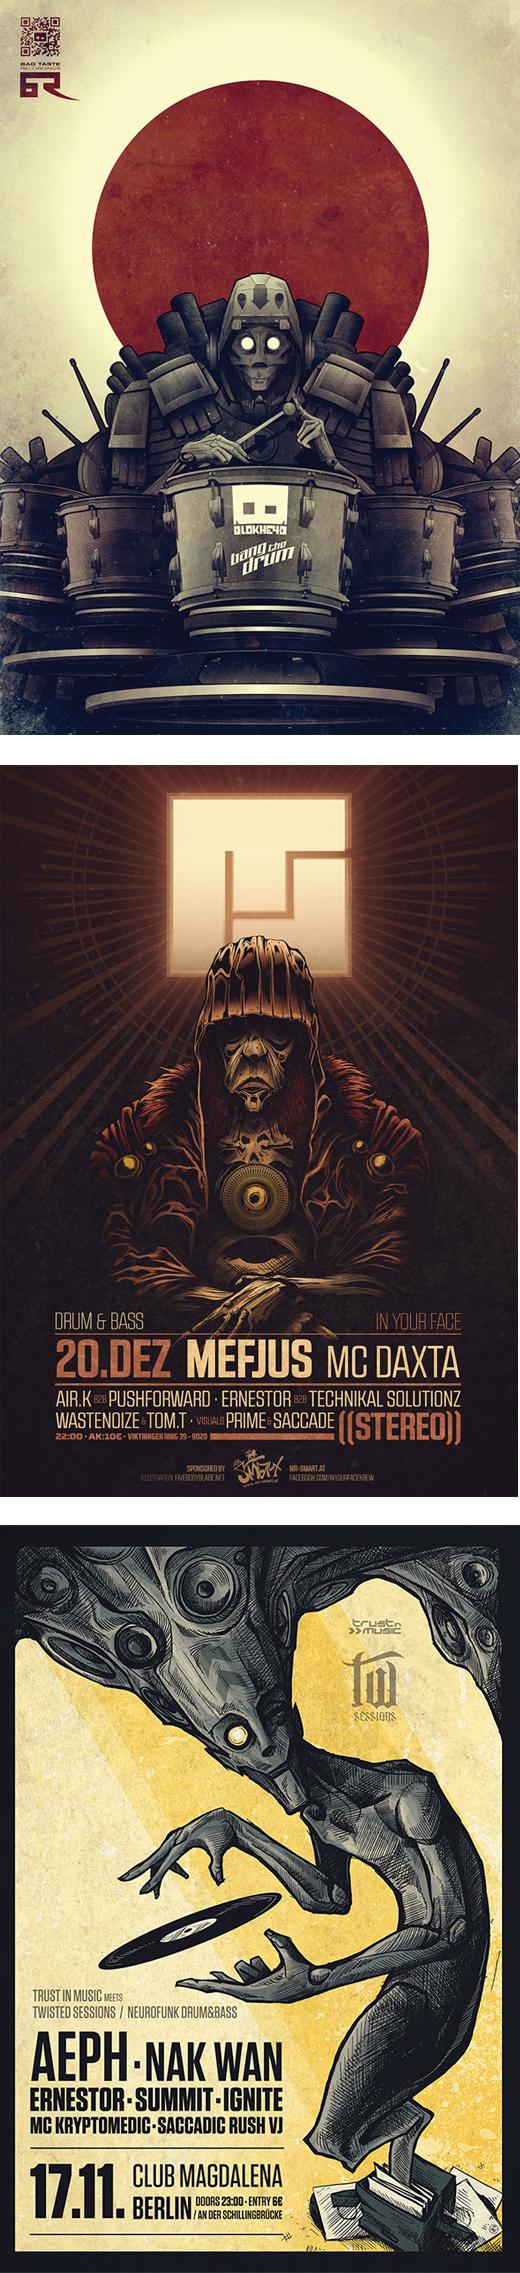 illustration event poster